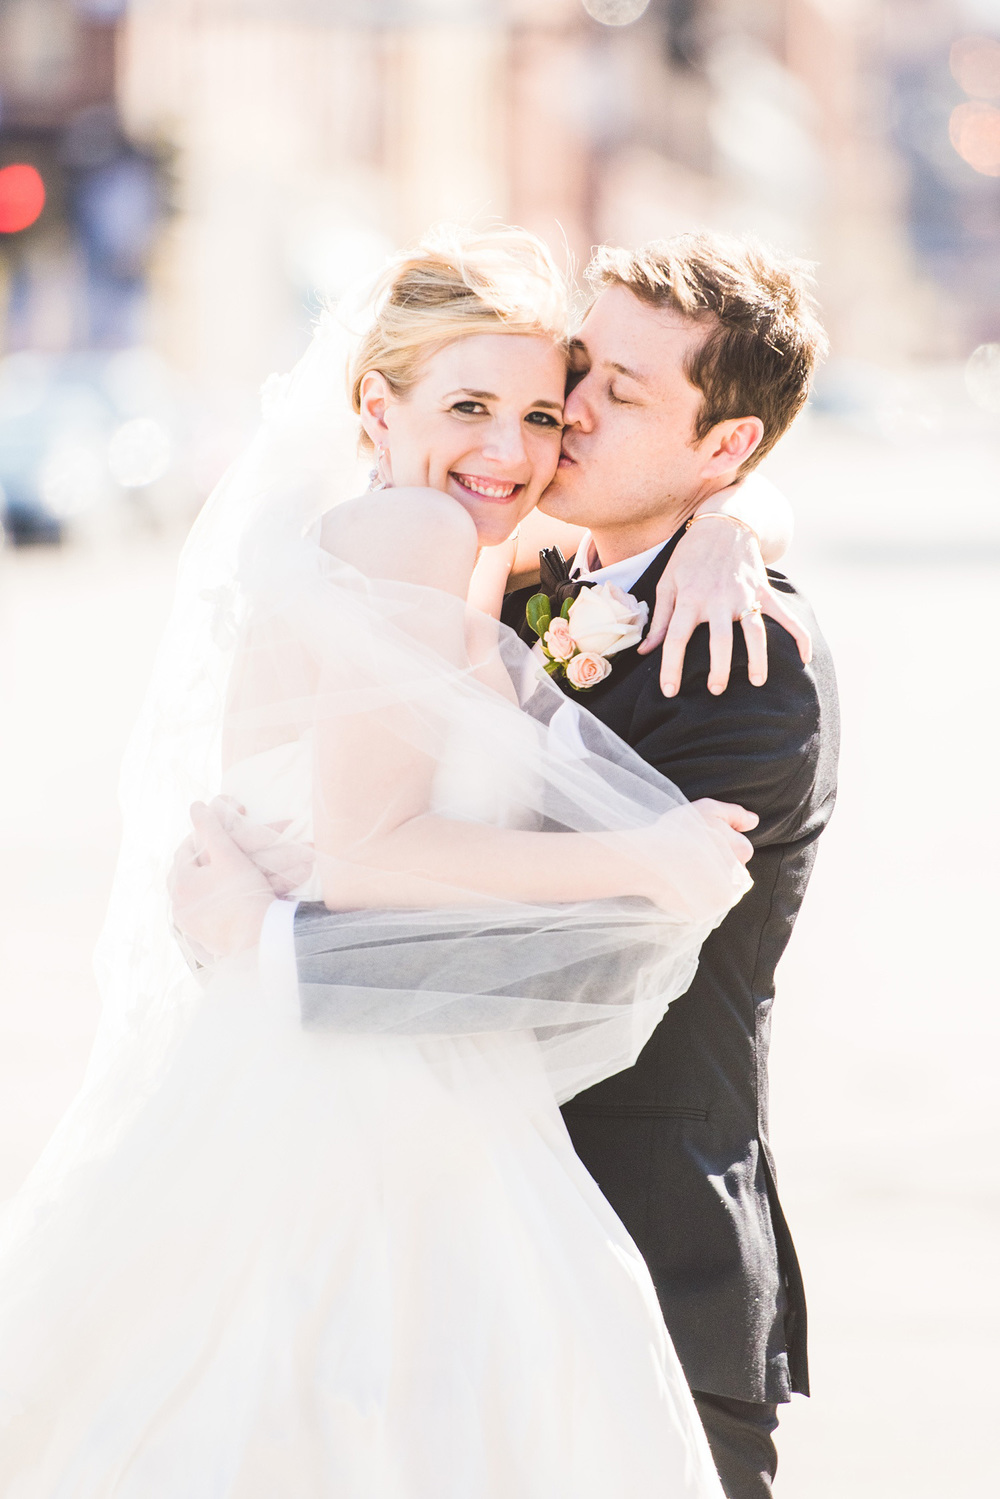 Best_wedding_photos_Minneapolis_minnesota_lucas_botz_photographty_78.jpg